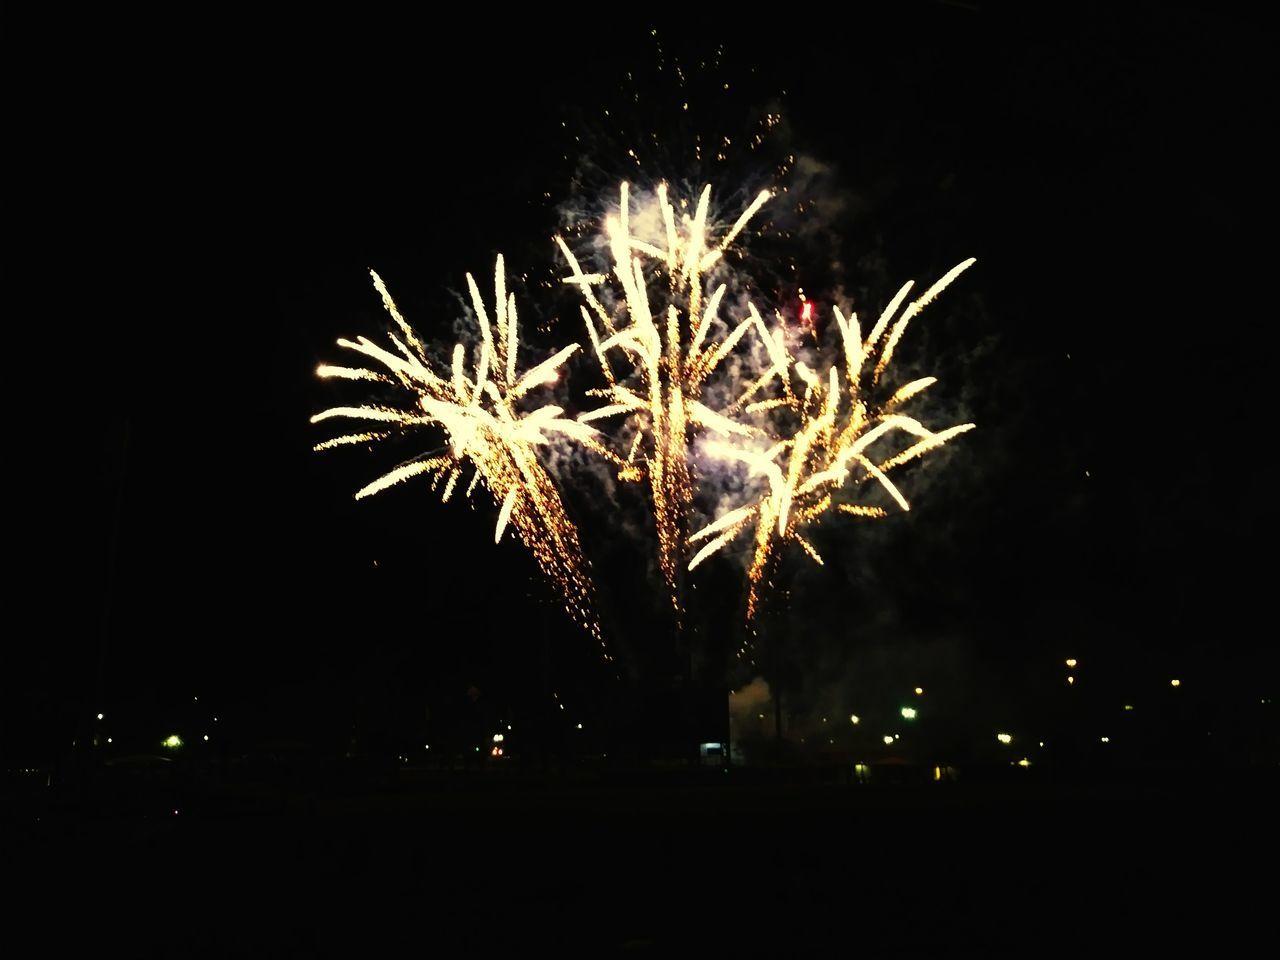 Firework Display Exploding Firework - Man Made Object Celebration Arts Culture And Entertainment Night Long Exposure Sparks Event Illuminated Awe Outdoors Sky JacksonvilleFL Baseball Game JumboShrimp EyeNewHere